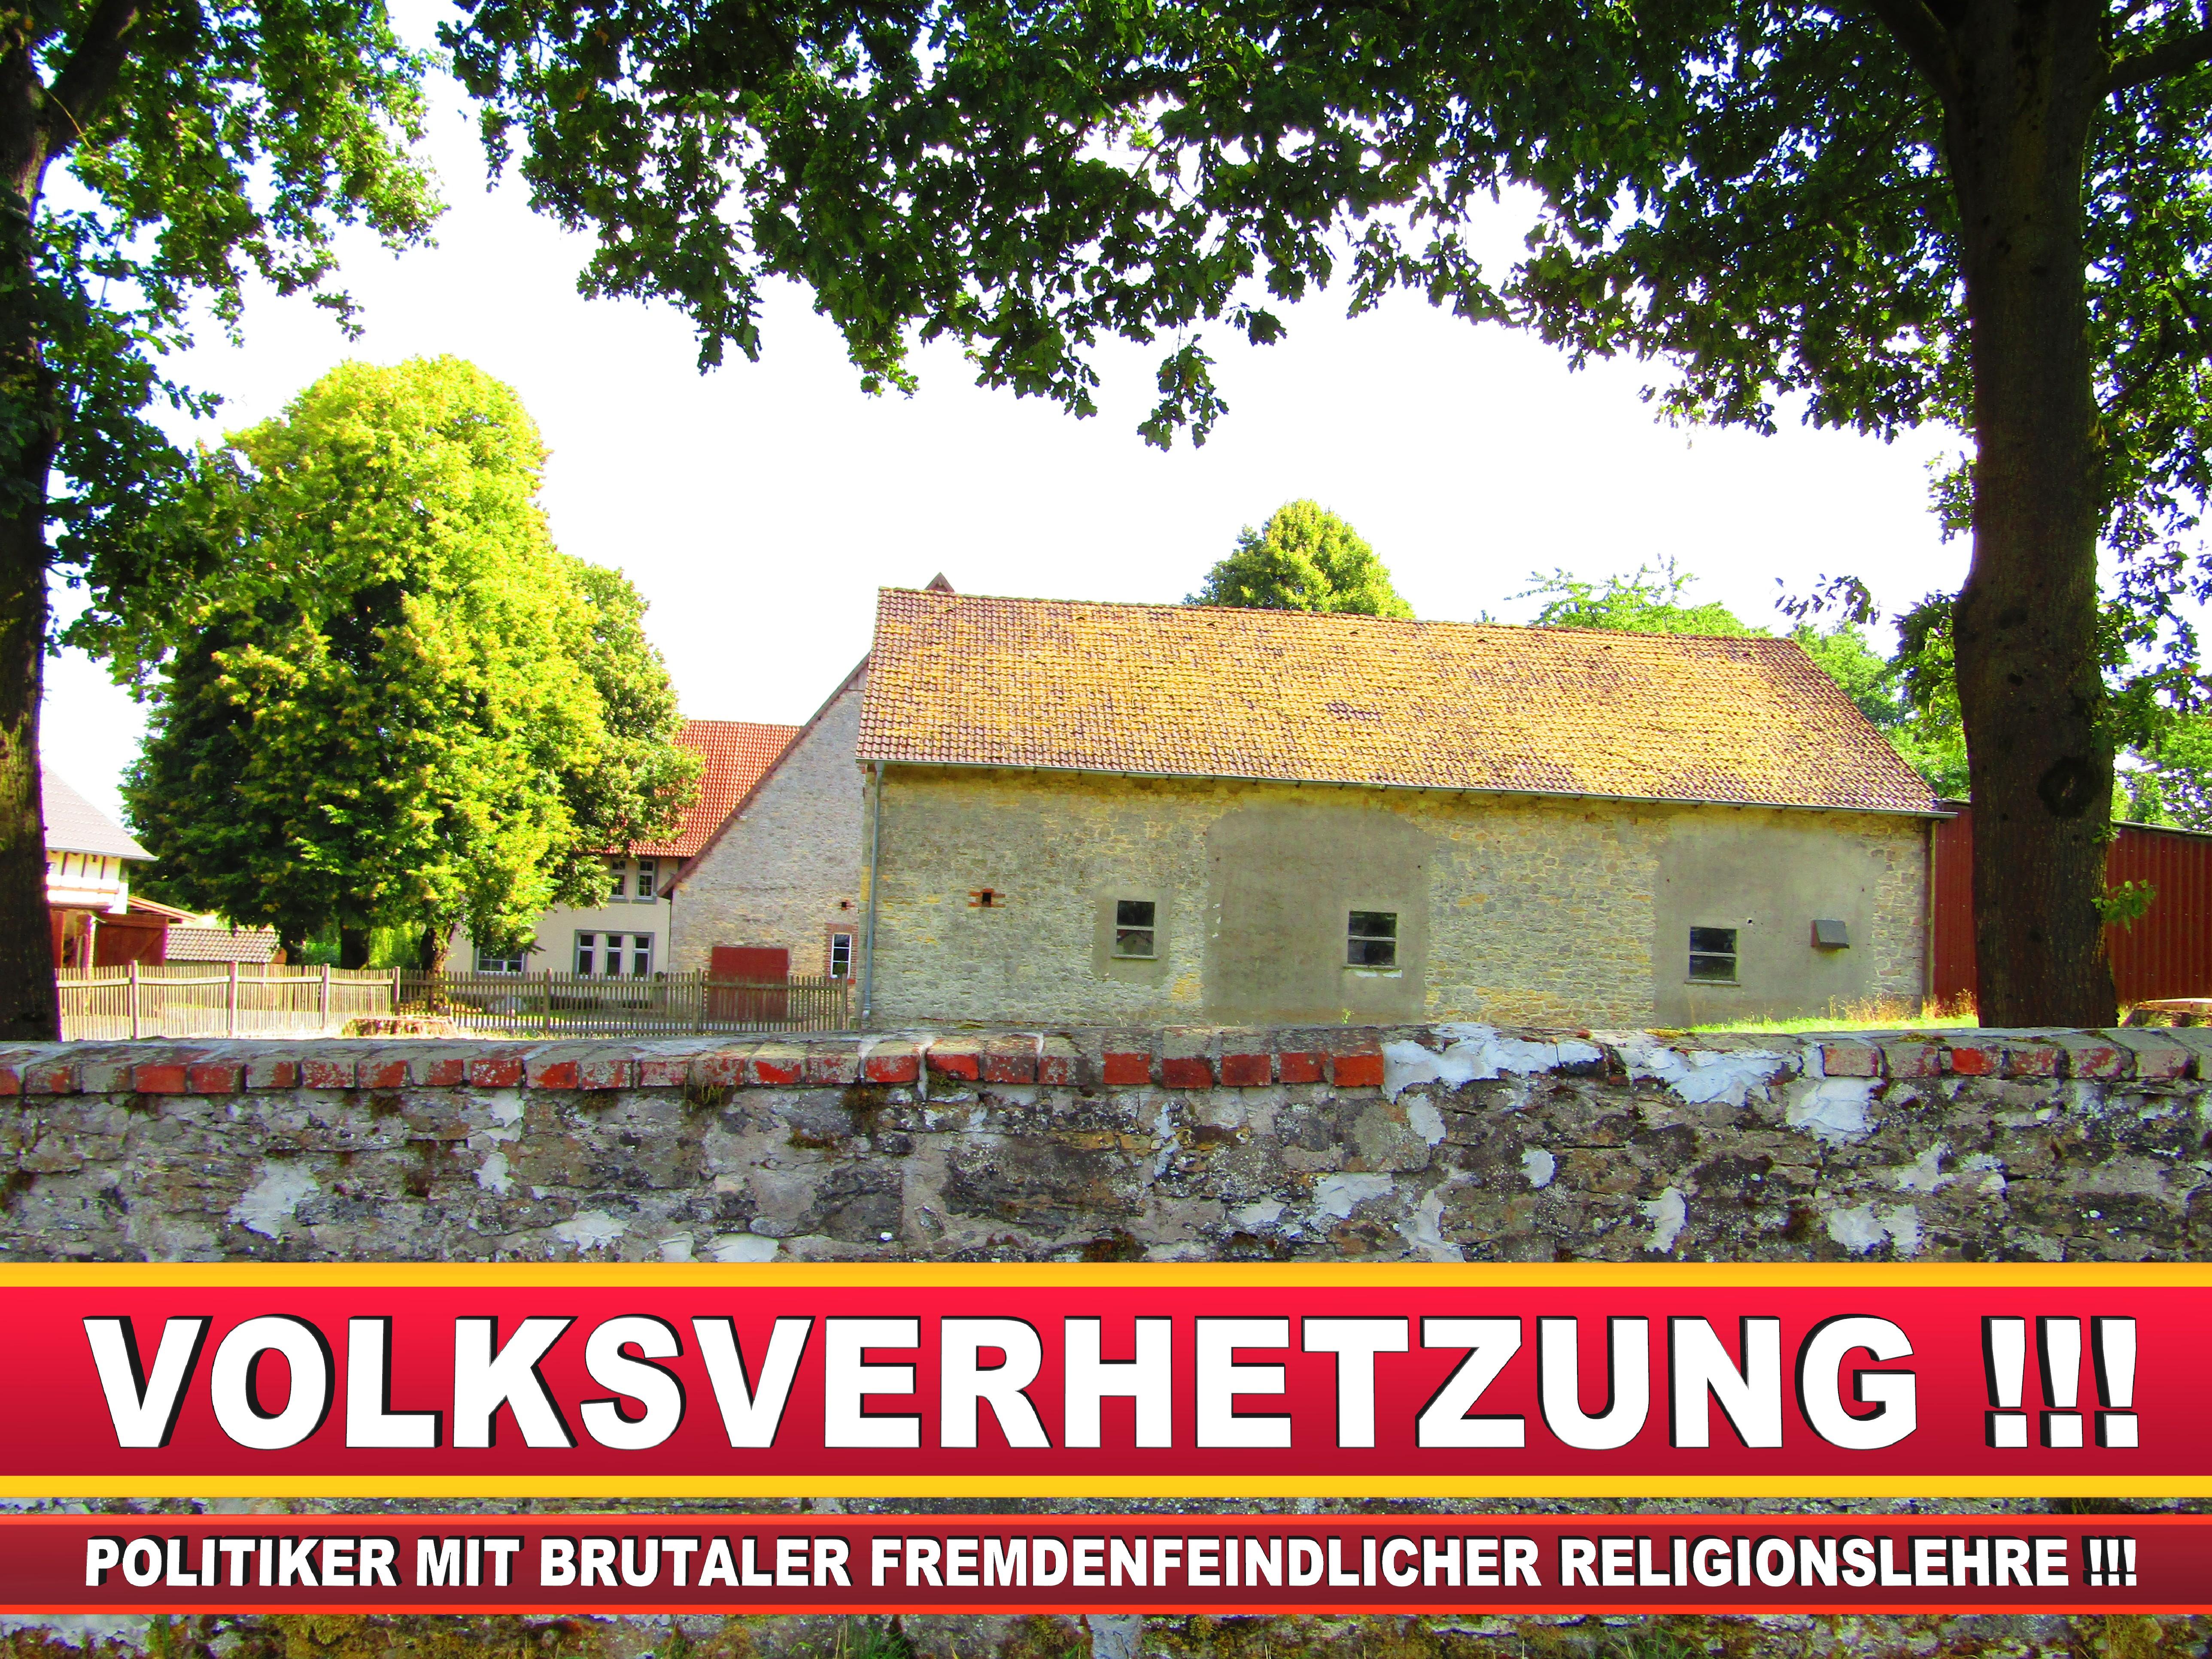 HENRICHSMEIER ERDBEEREN BIELEFELD CDU BIELEFELD (1) LANDTAGSWAHL BUNDESTAGSWAHL BÜRGERMEISTERWAHL